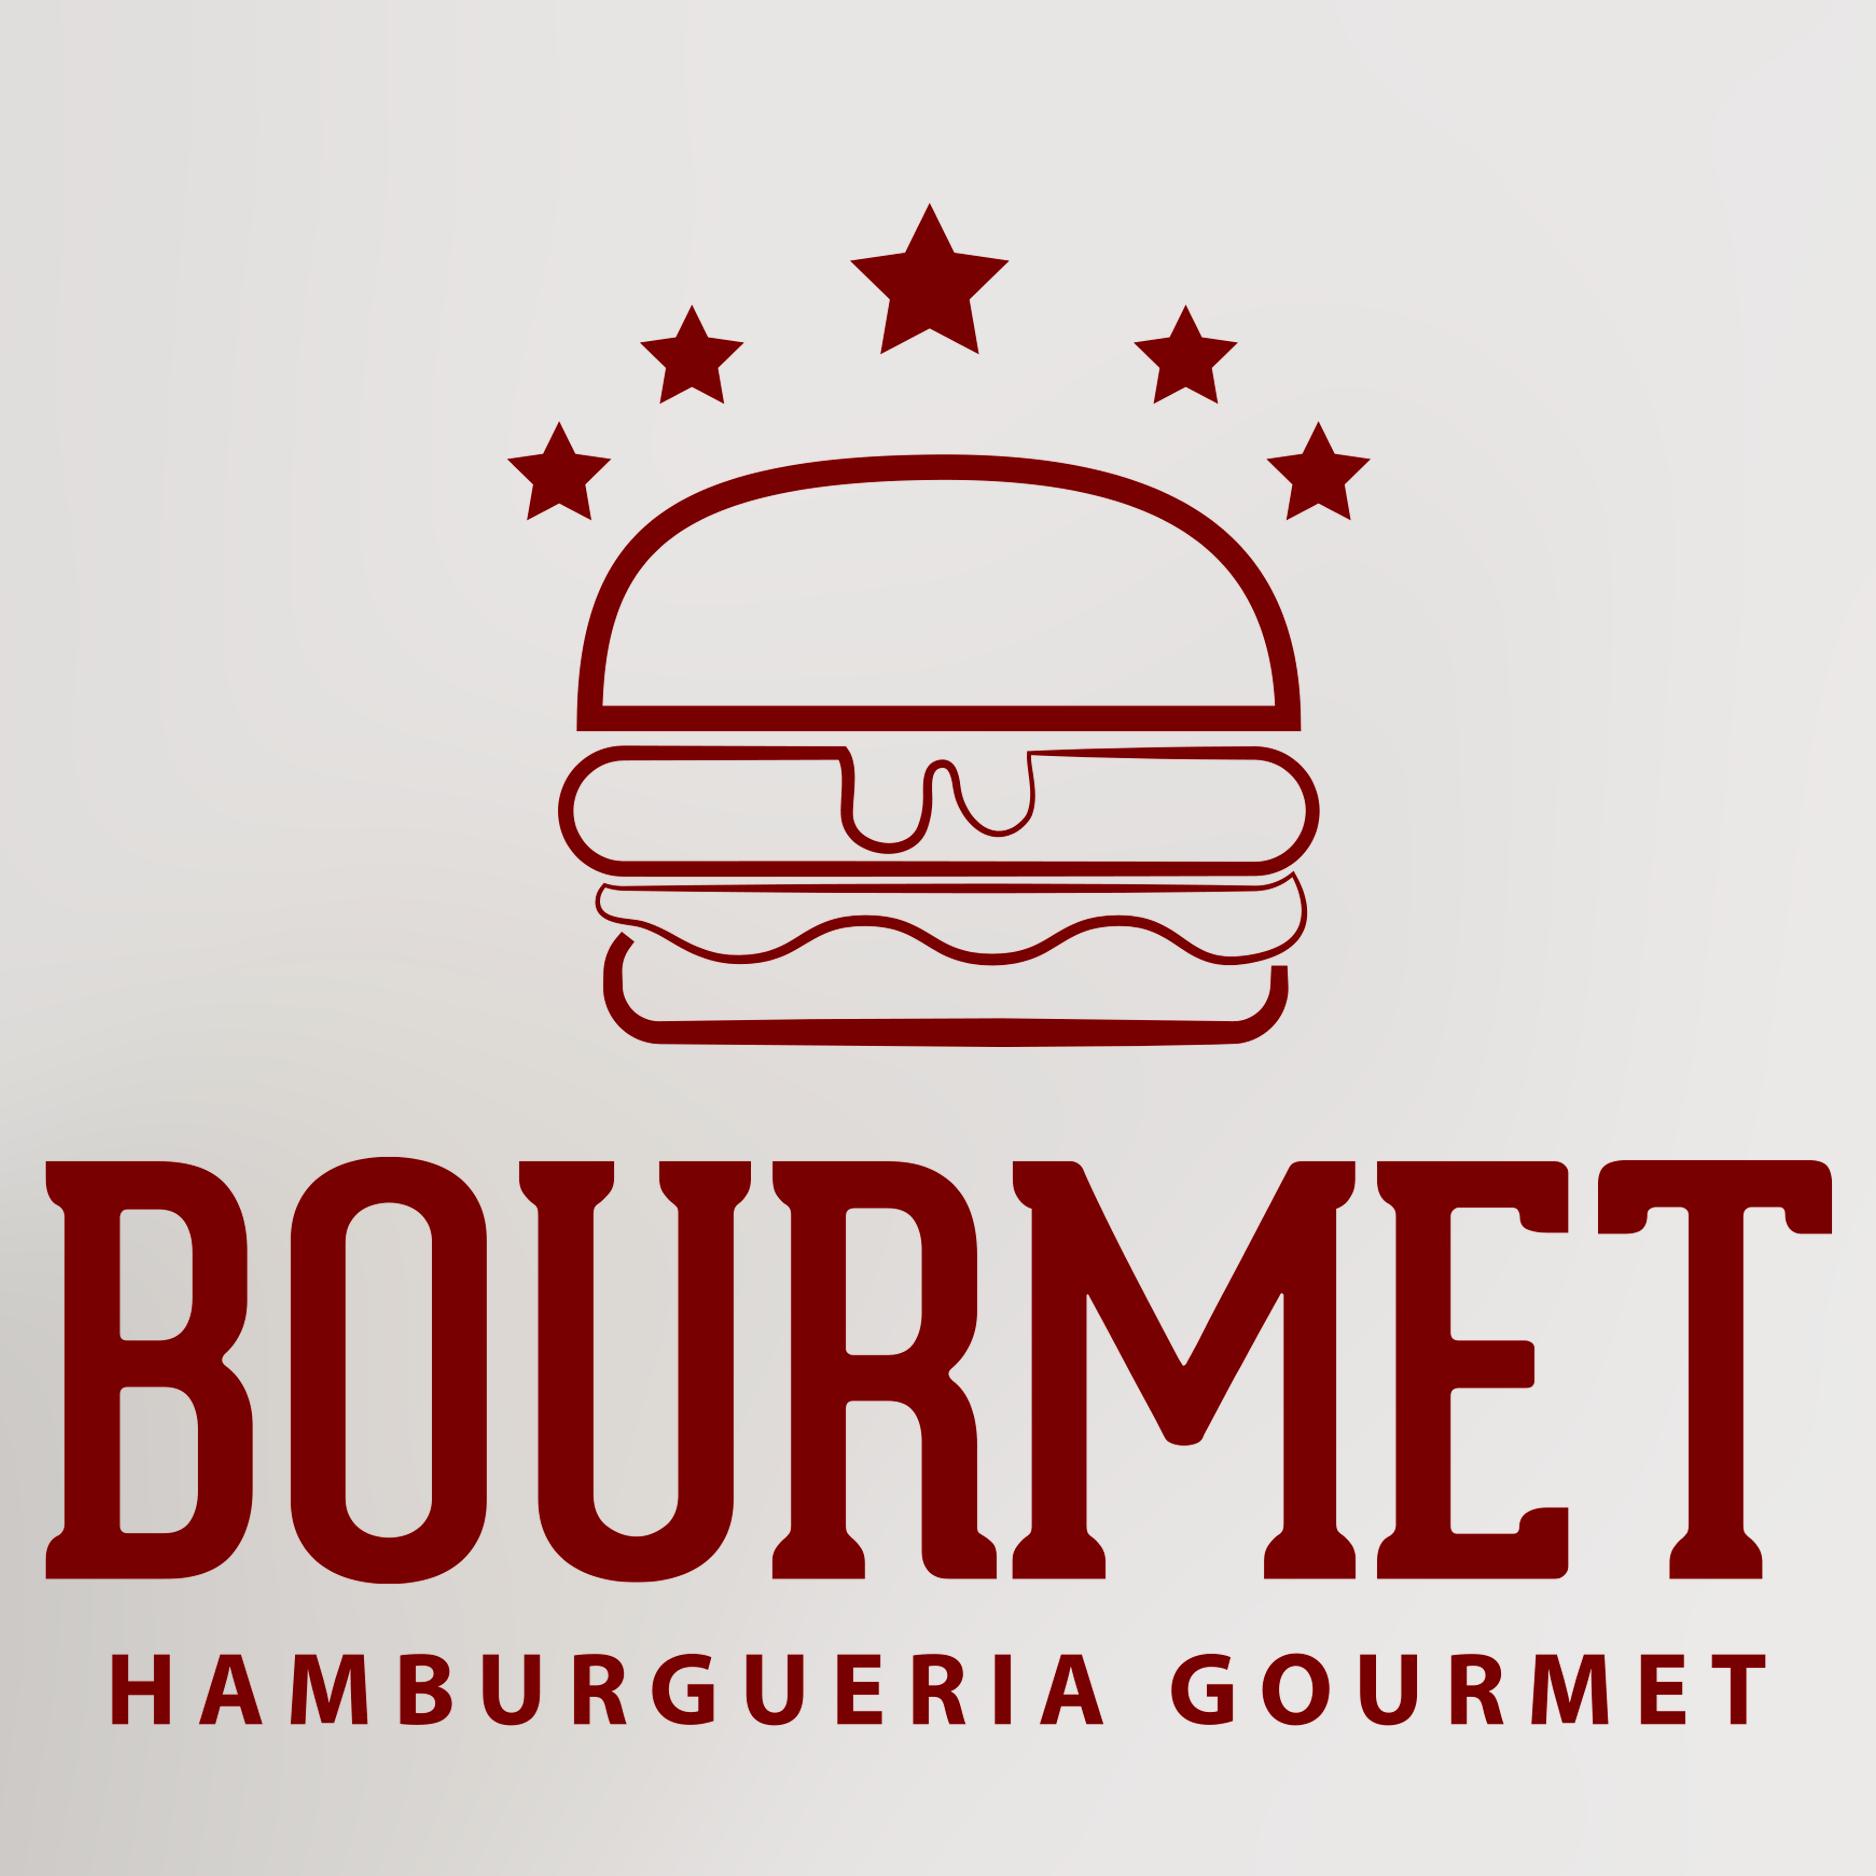 Delivery Bourmet Hamburgueria Gourmet